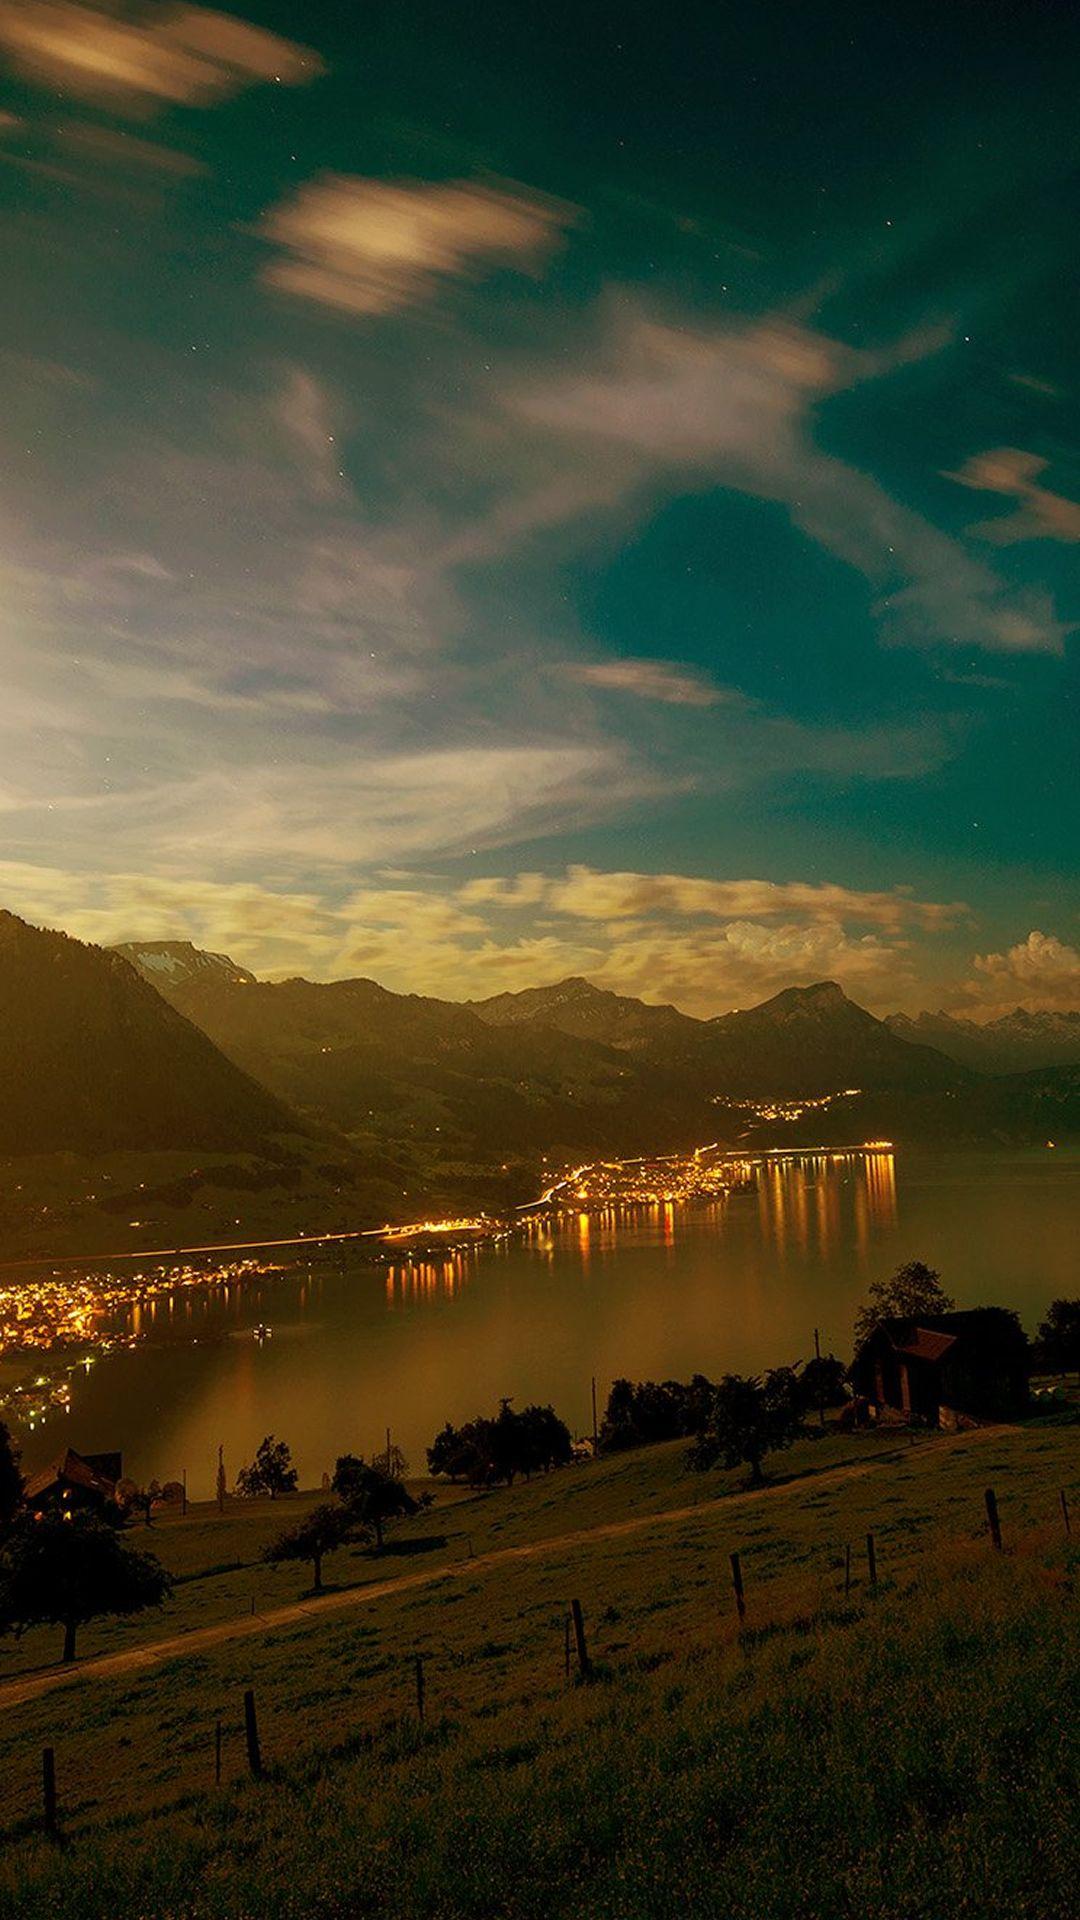 Lake Mountain City Village Night Light Nature Iphone 8 Wallpapers